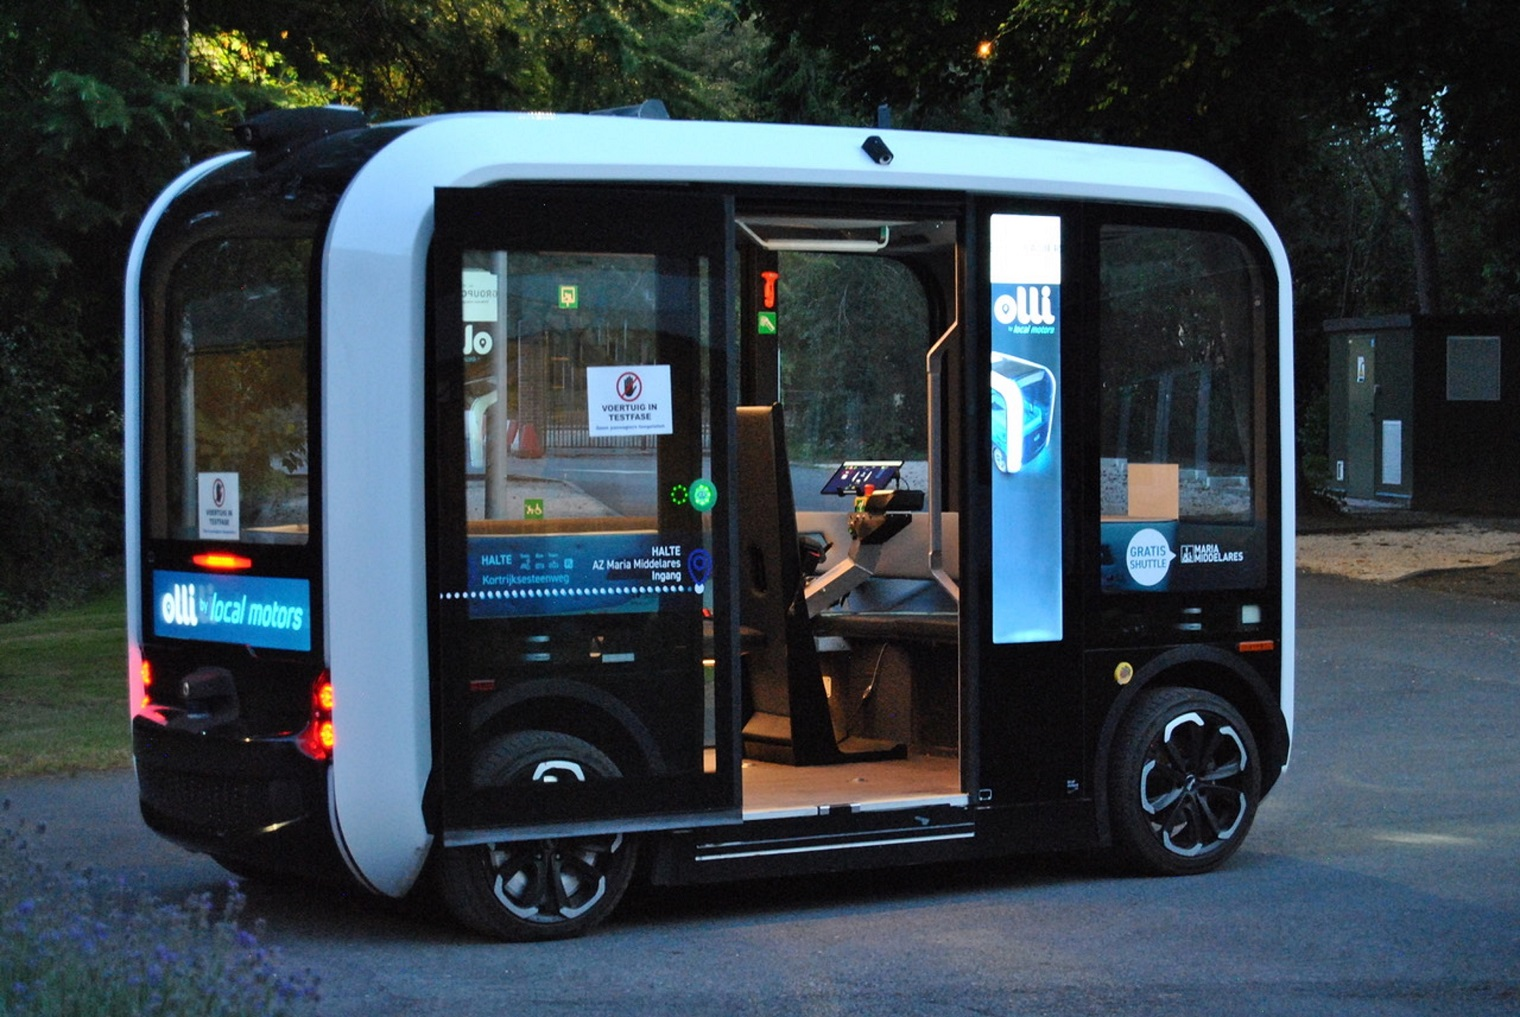 Esterni Olli, minibus elettrico guida autonoma